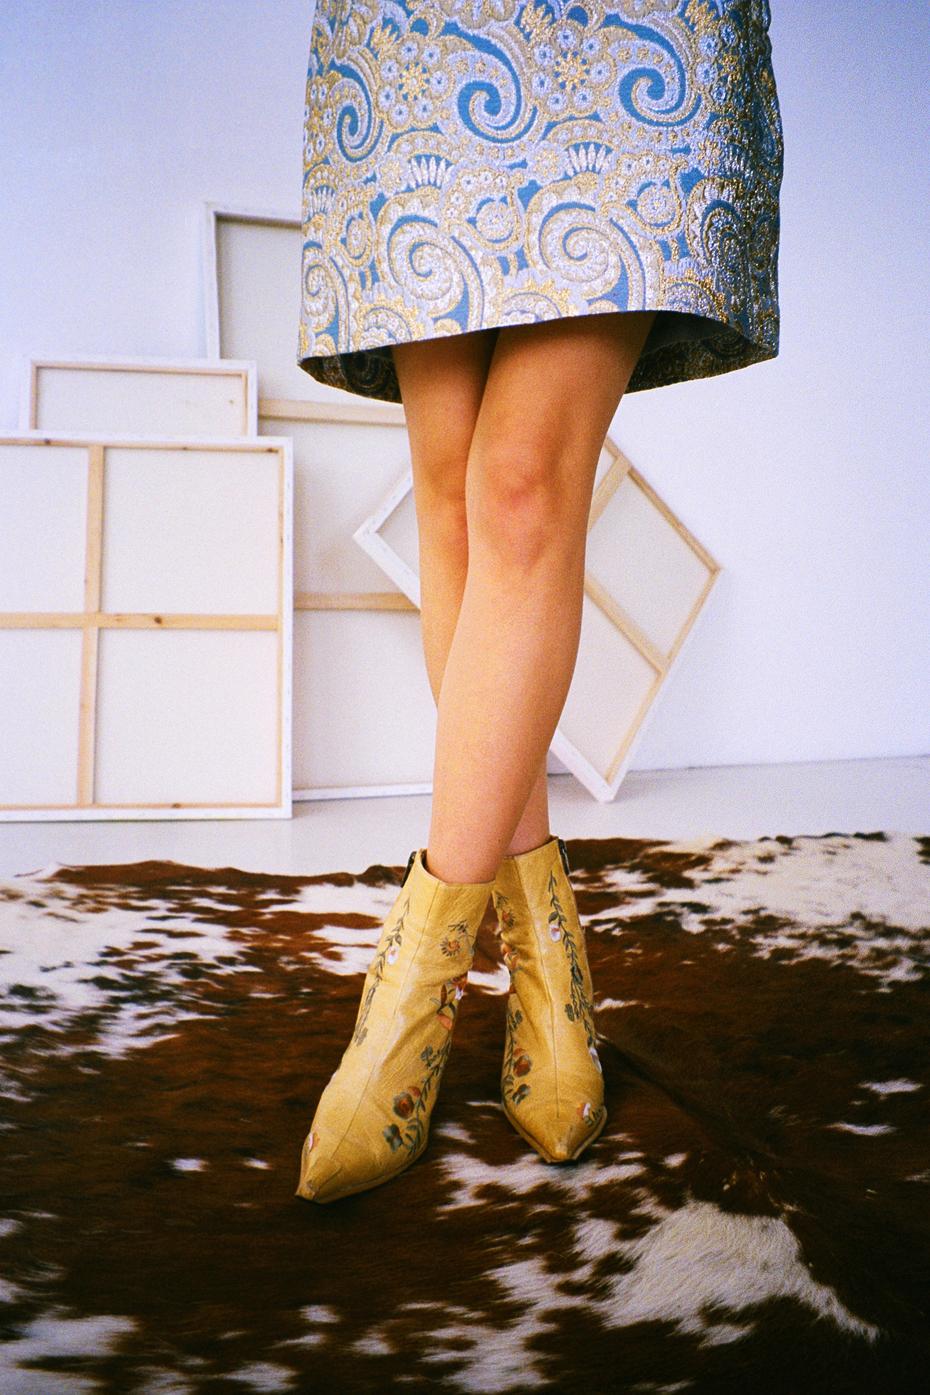 rich girl - chloe nour 4